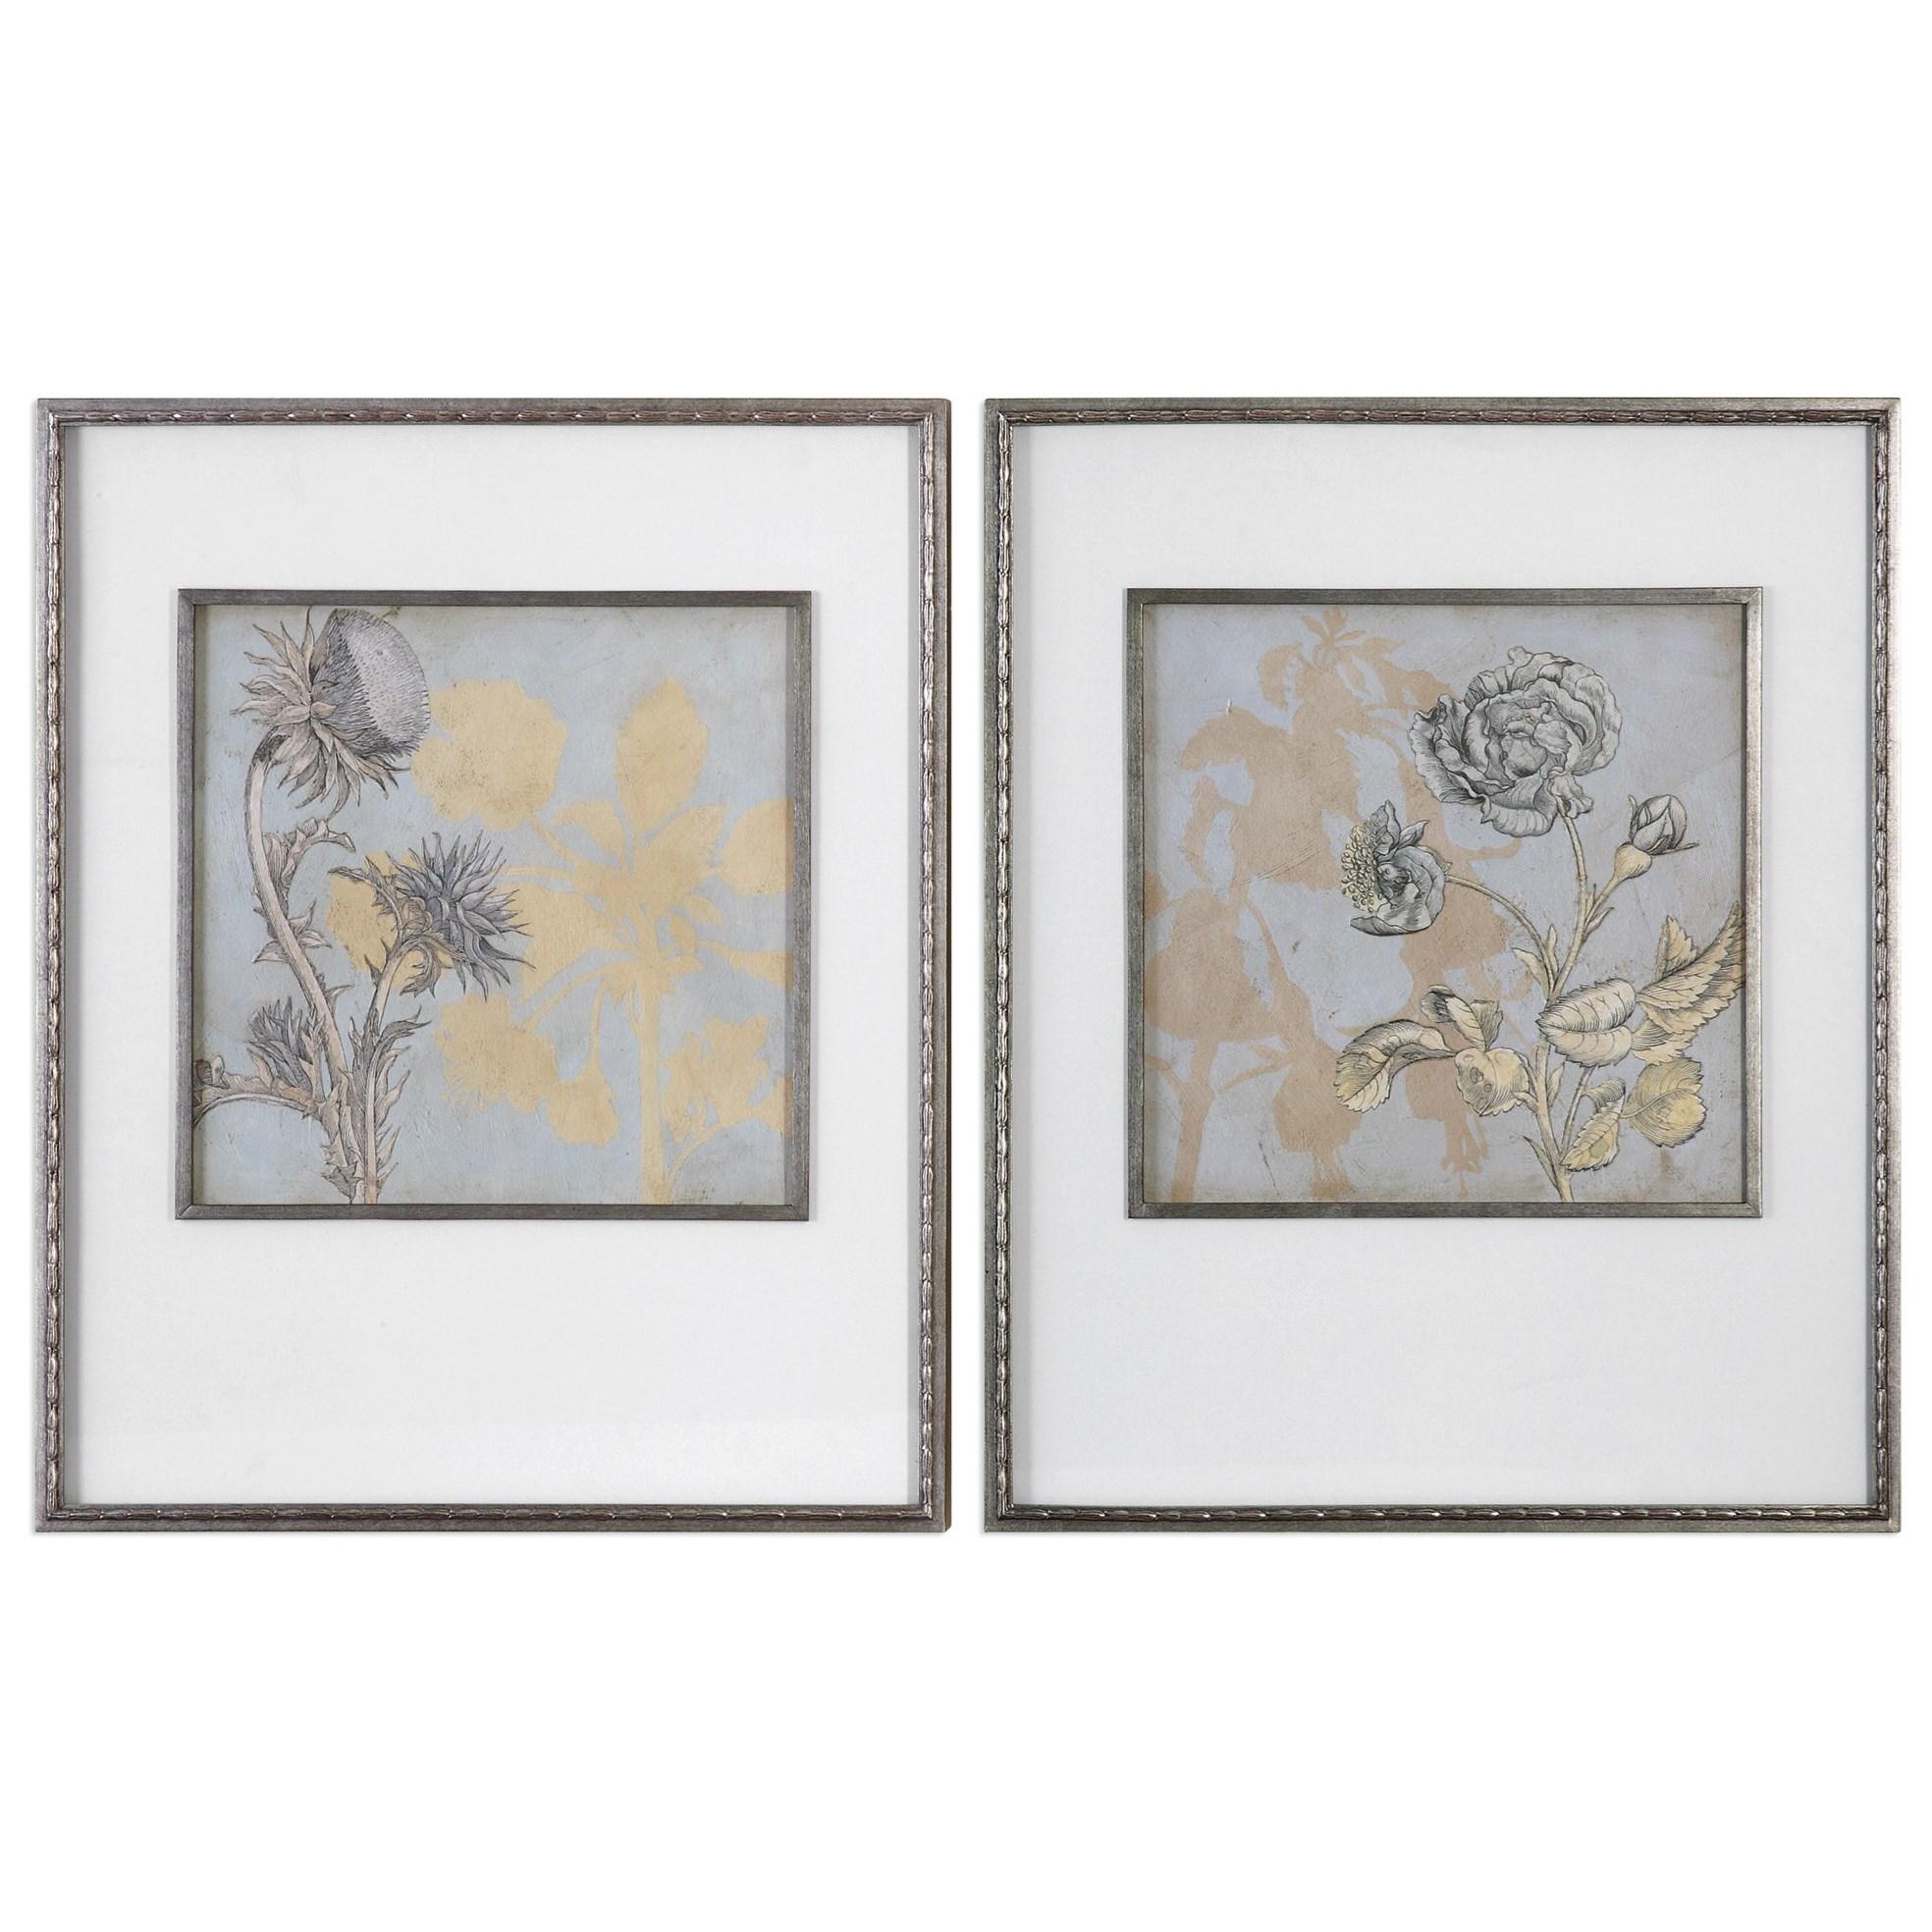 Uttermost Art Shadow Florals (Set of 2) - Item Number: 41562